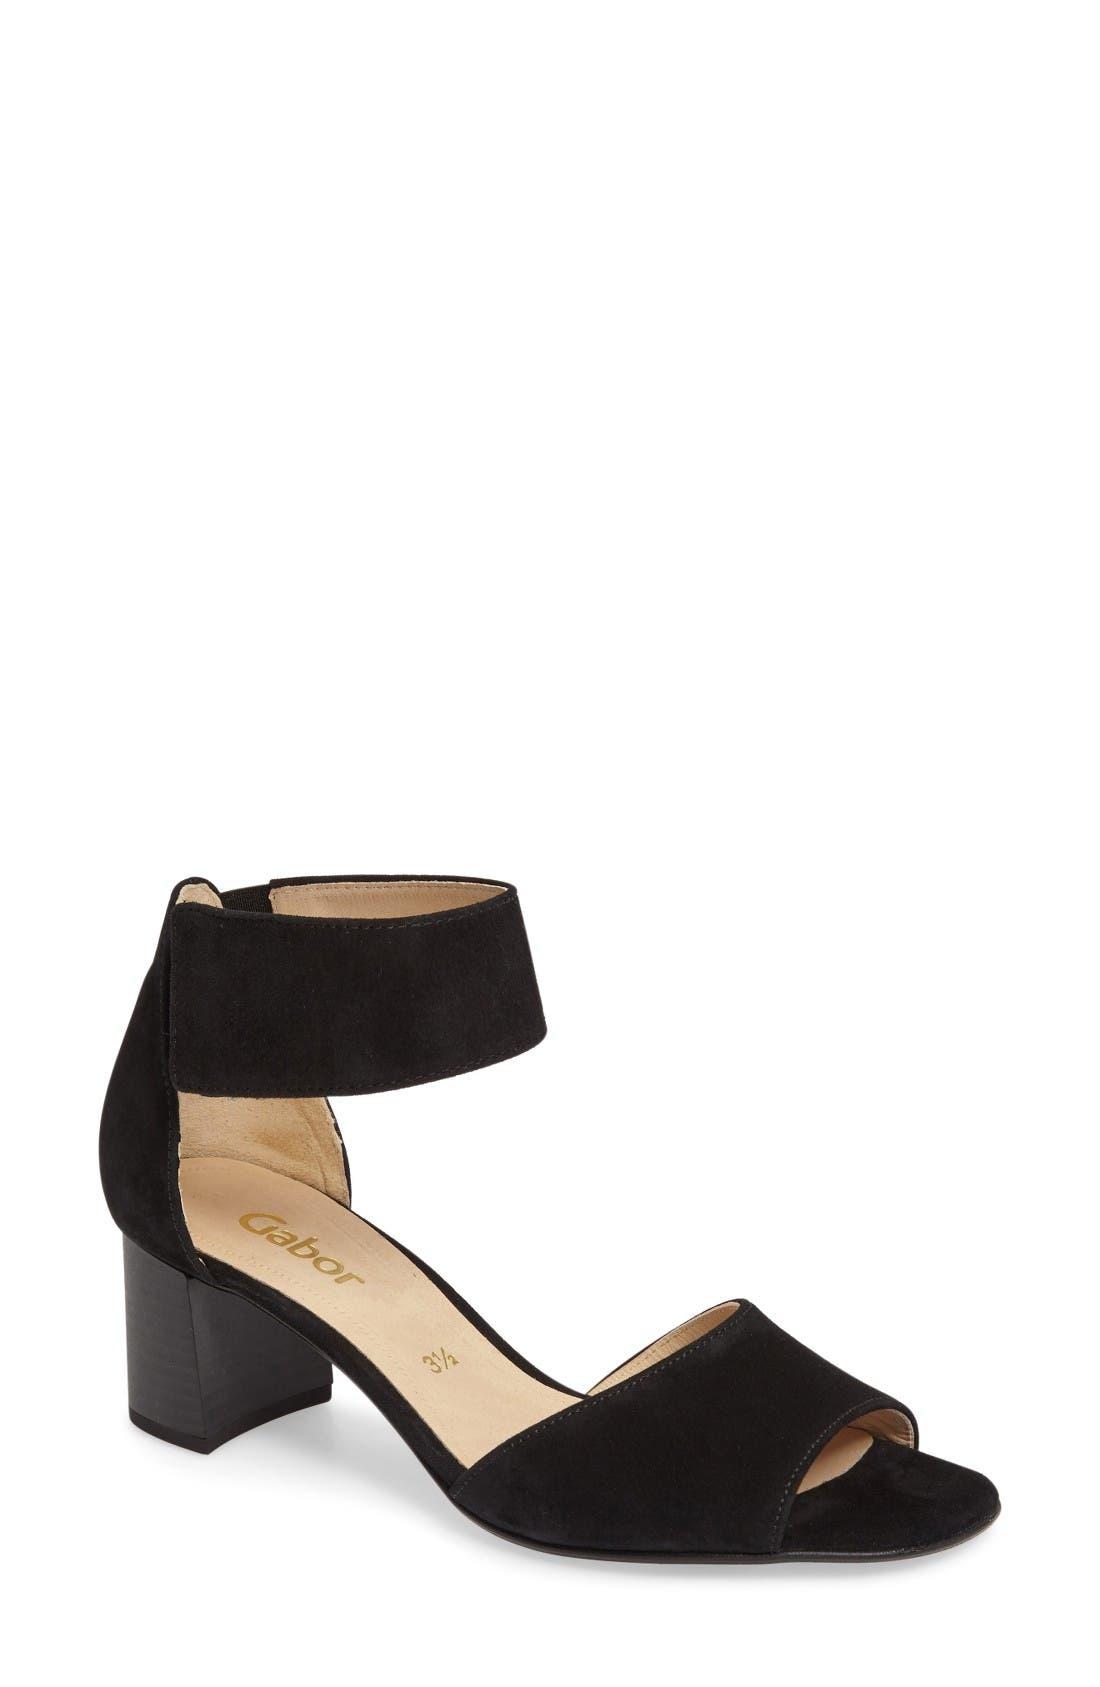 Main Image - Gabor Ankle Strap Sandal (Women)